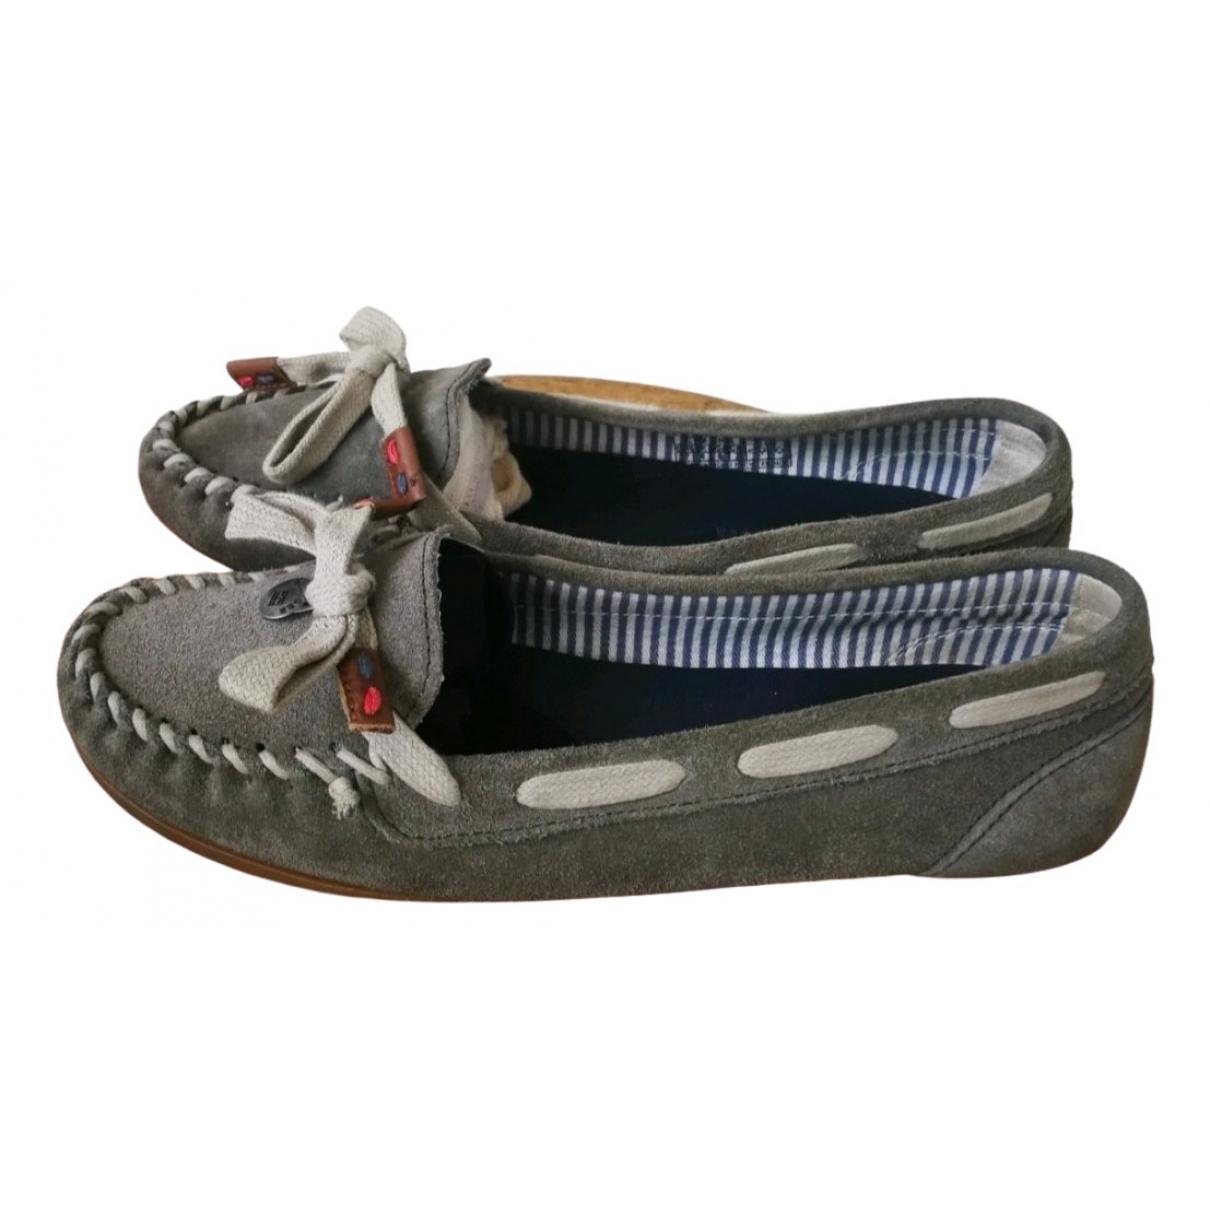 Tommy Hilfiger \N Khaki Leather Flats for Women 37 EU